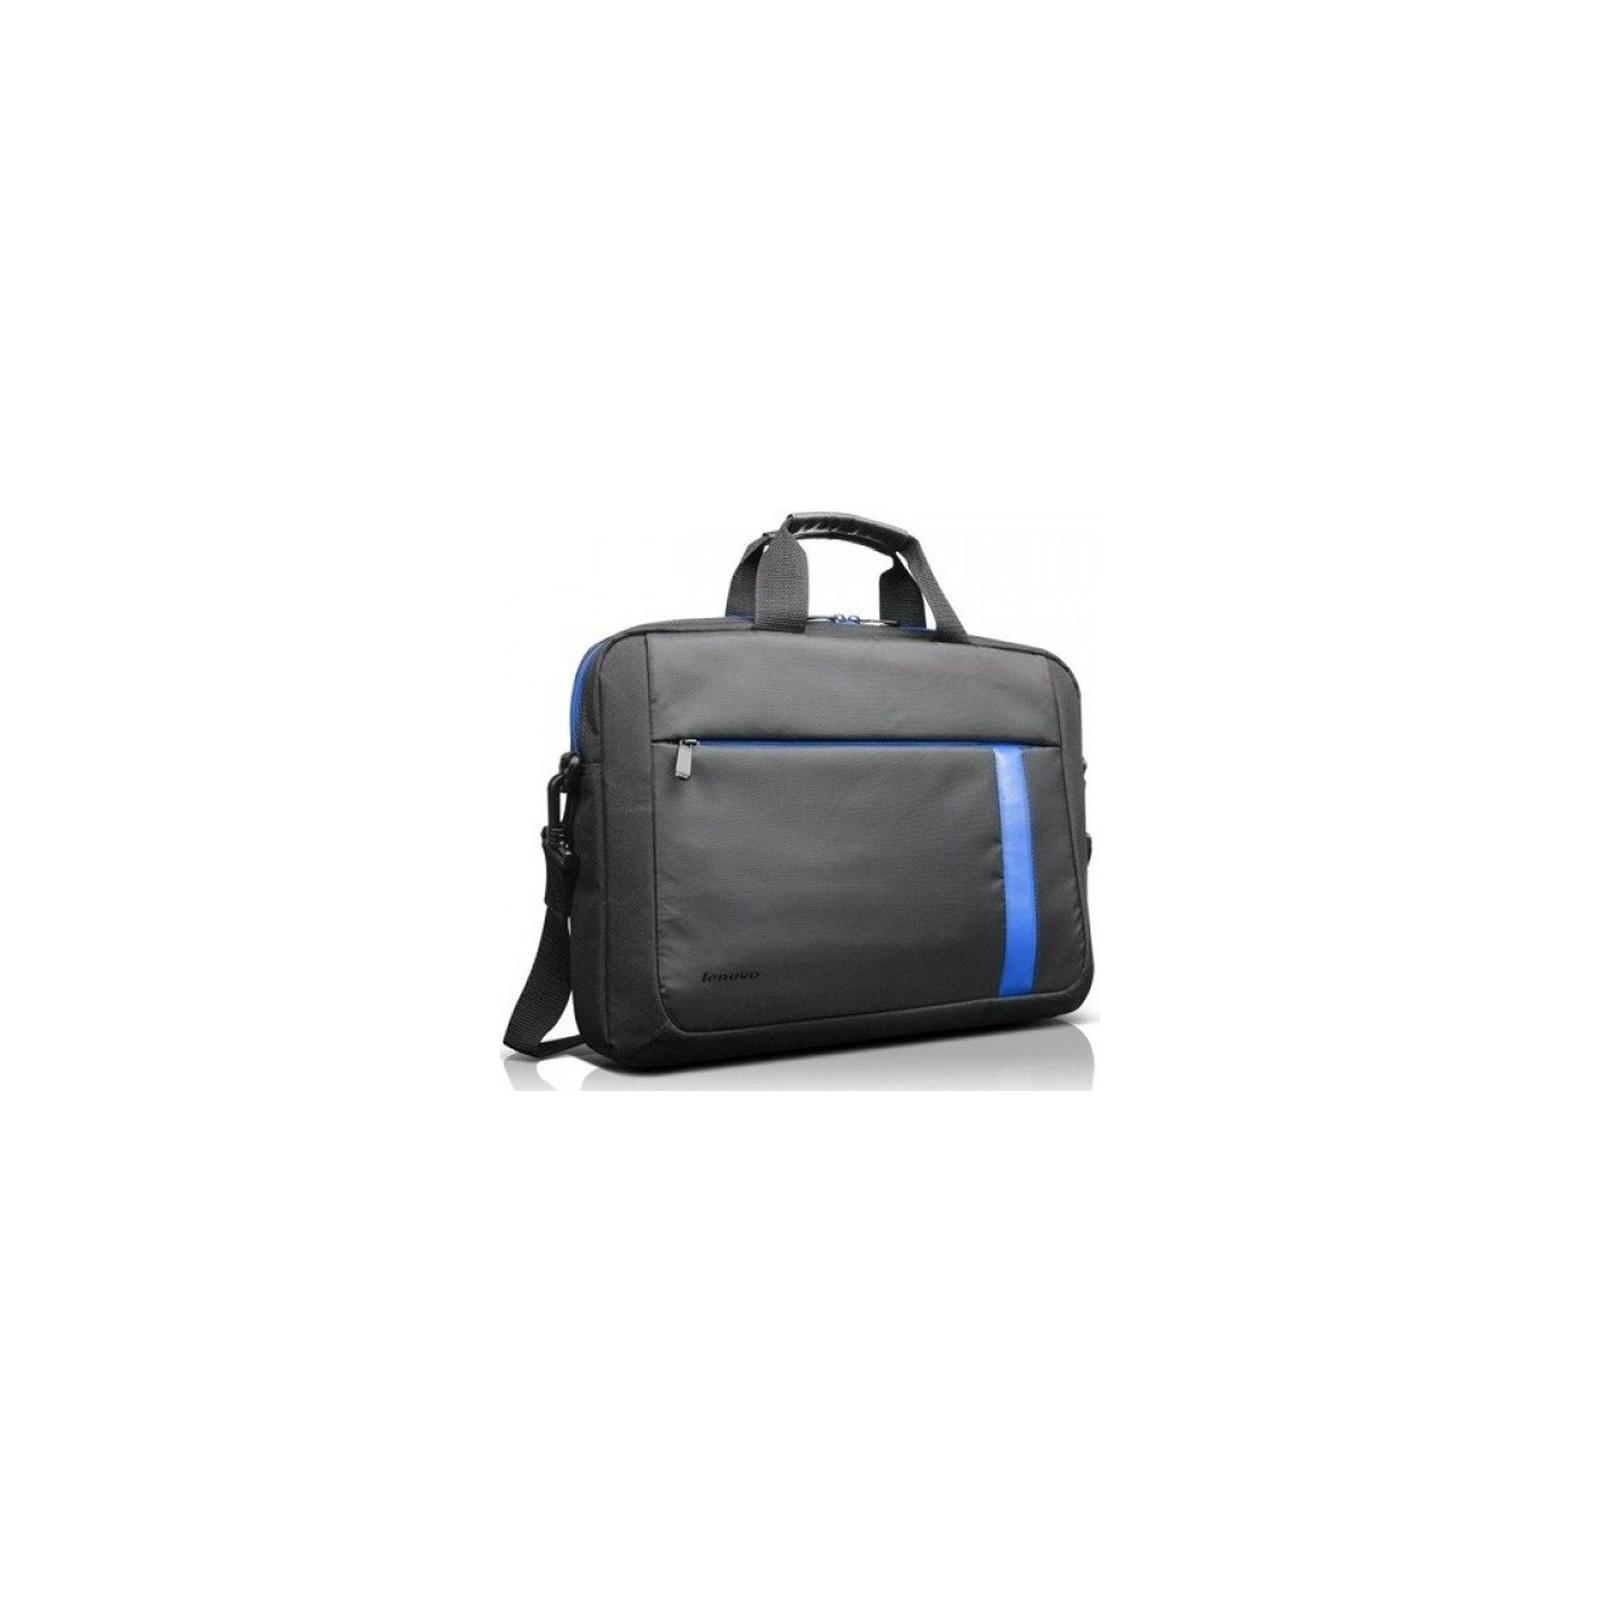 Сумка для ноутбука Lenovo 15.6 CARRYING CASE Toploader T2050 (888013750)